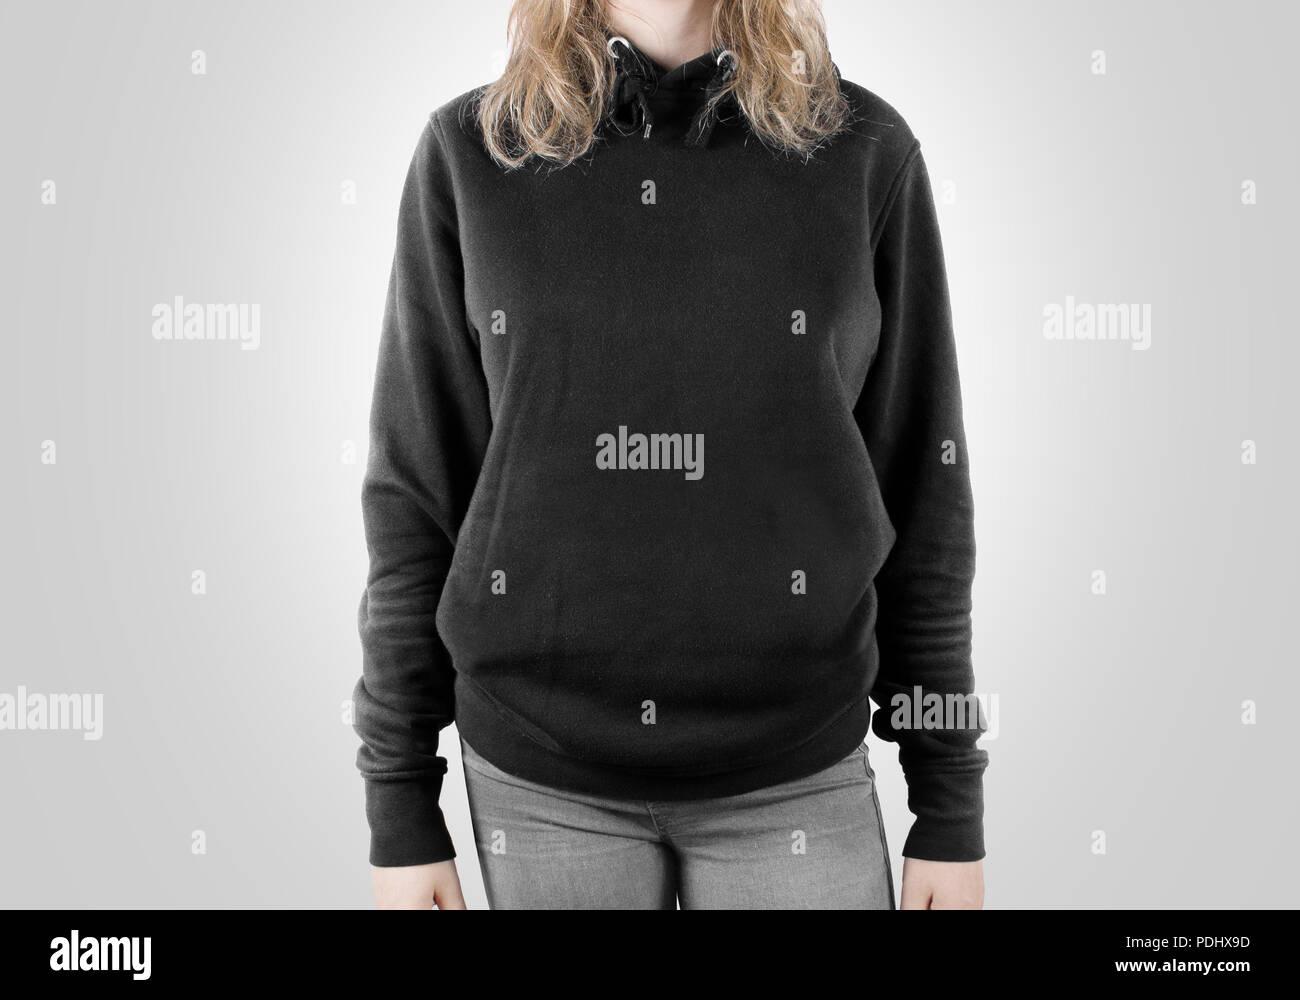 Blank Black Sweatshirt Mock Up Isolated Female Wear Dark Hoodie Mockup Plain Hoody Design Presentation Clear Gray Loose Overall Model